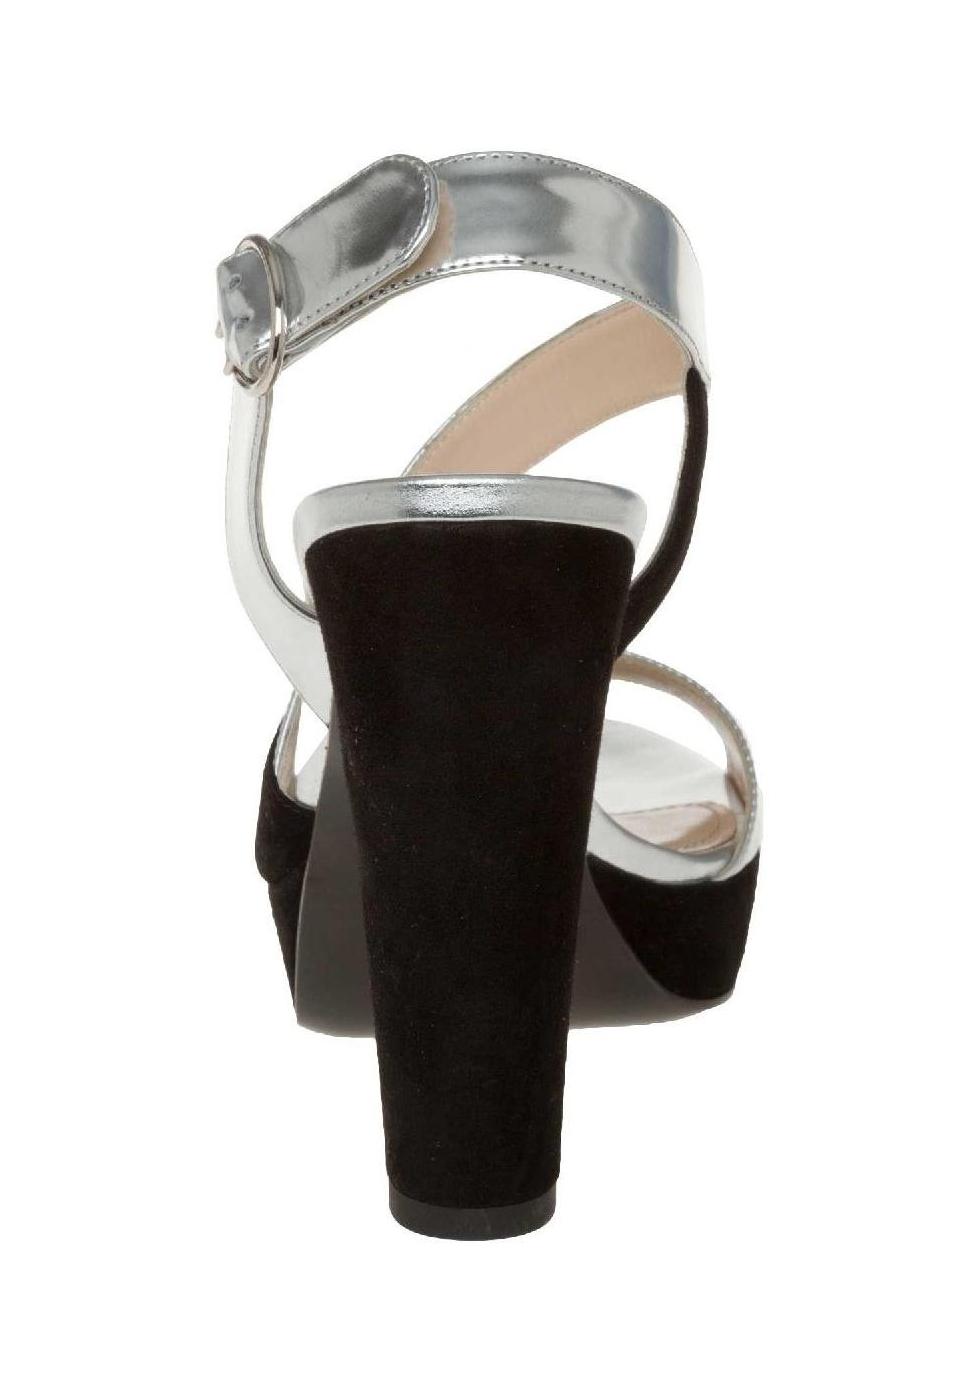 prada Sandali Prada in pelle laminata argento e camoscio nero yBI3I